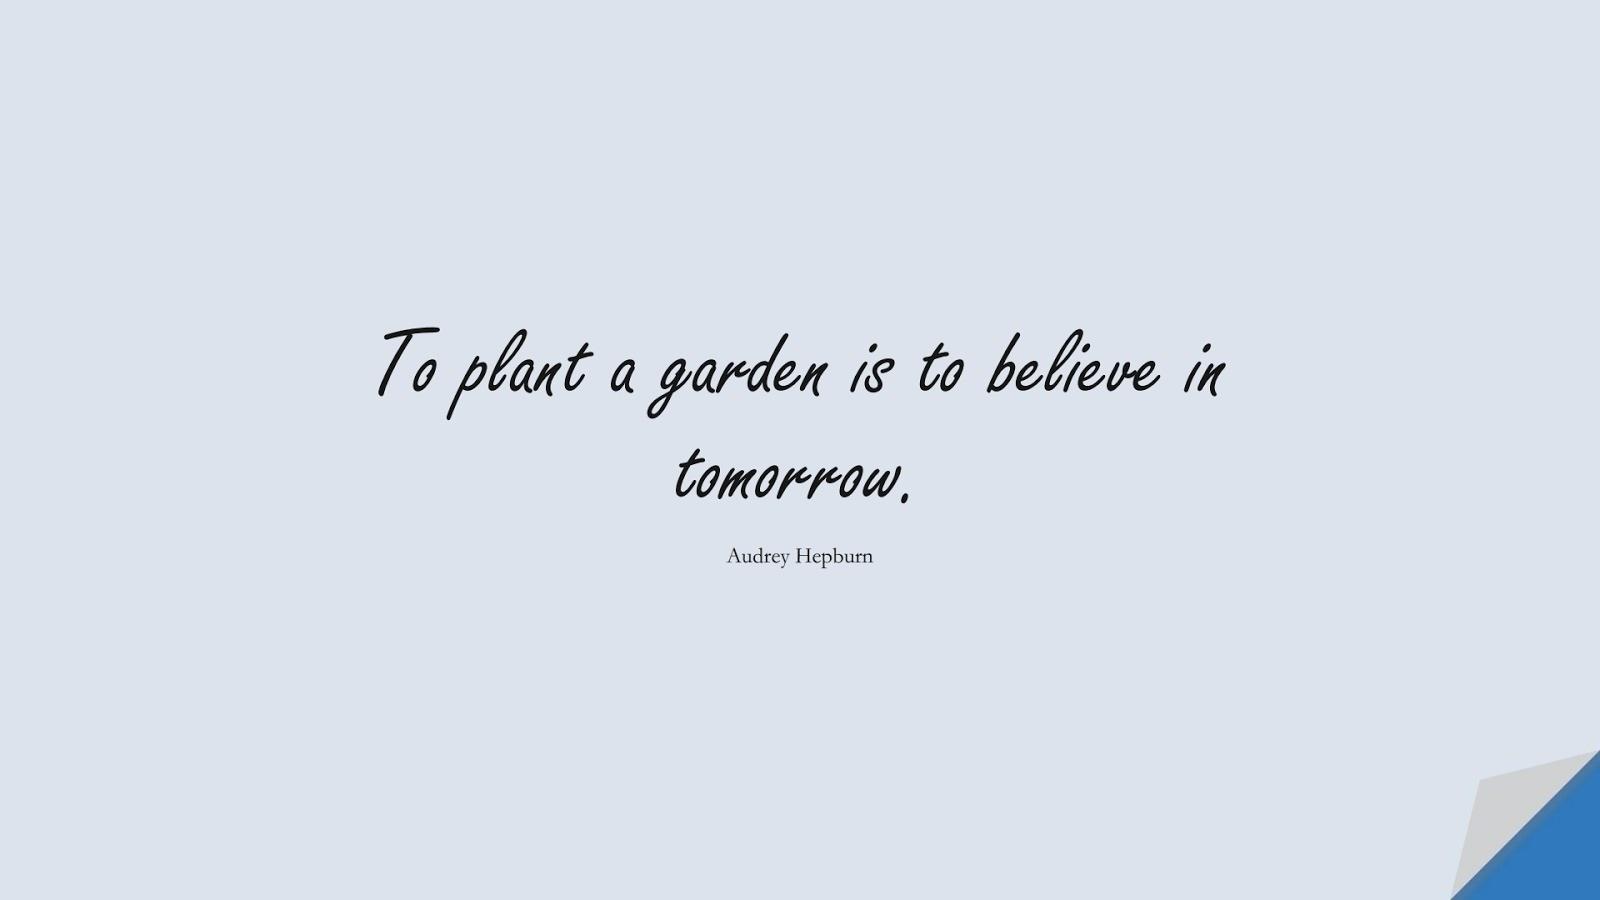 To plant a garden is to believe in tomorrow. (Audrey Hepburn);  #HopeQuotes